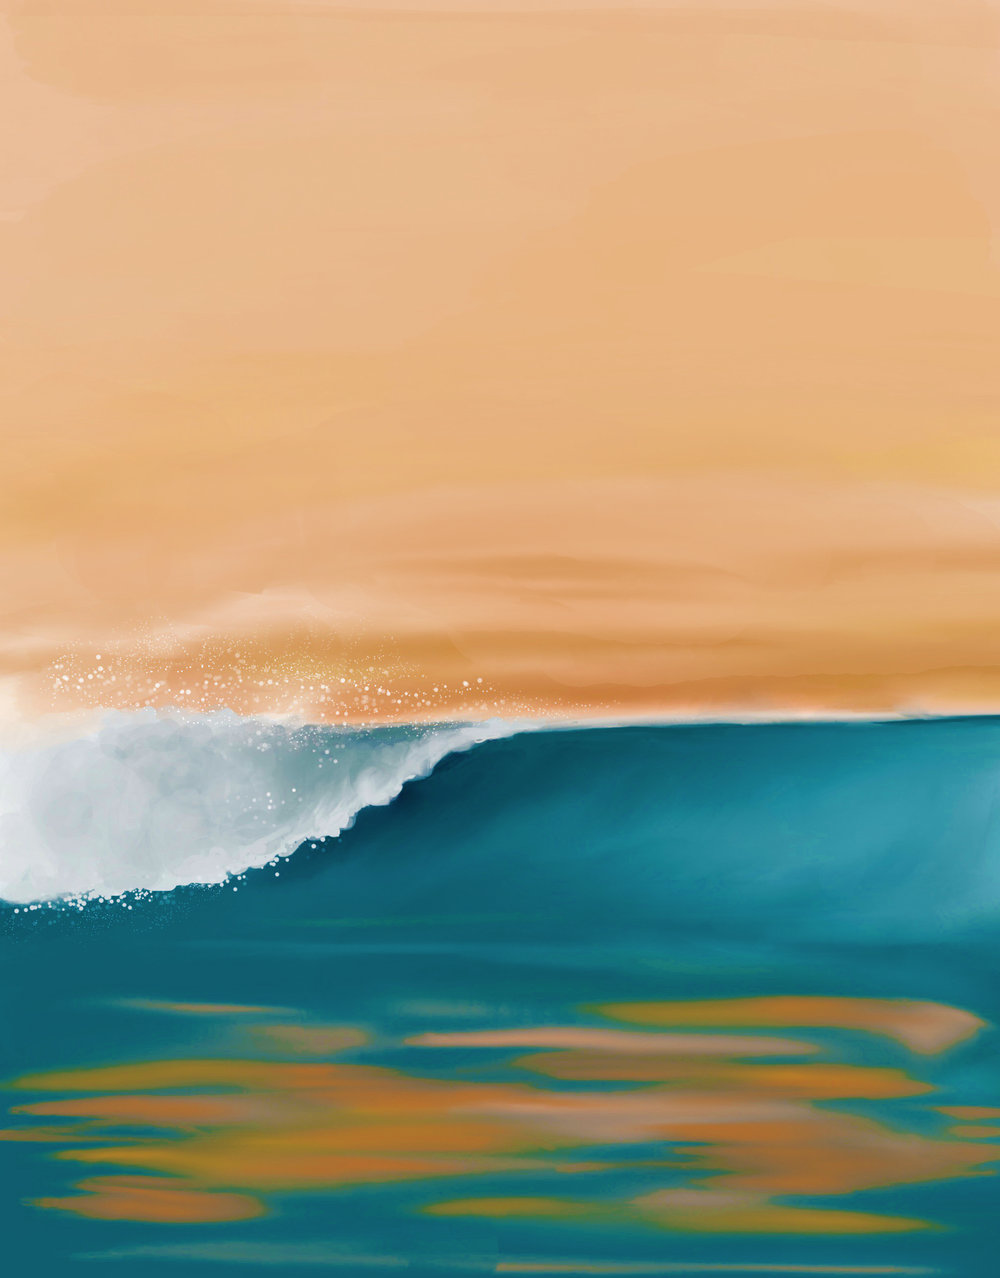 ocean beach hummingart studio